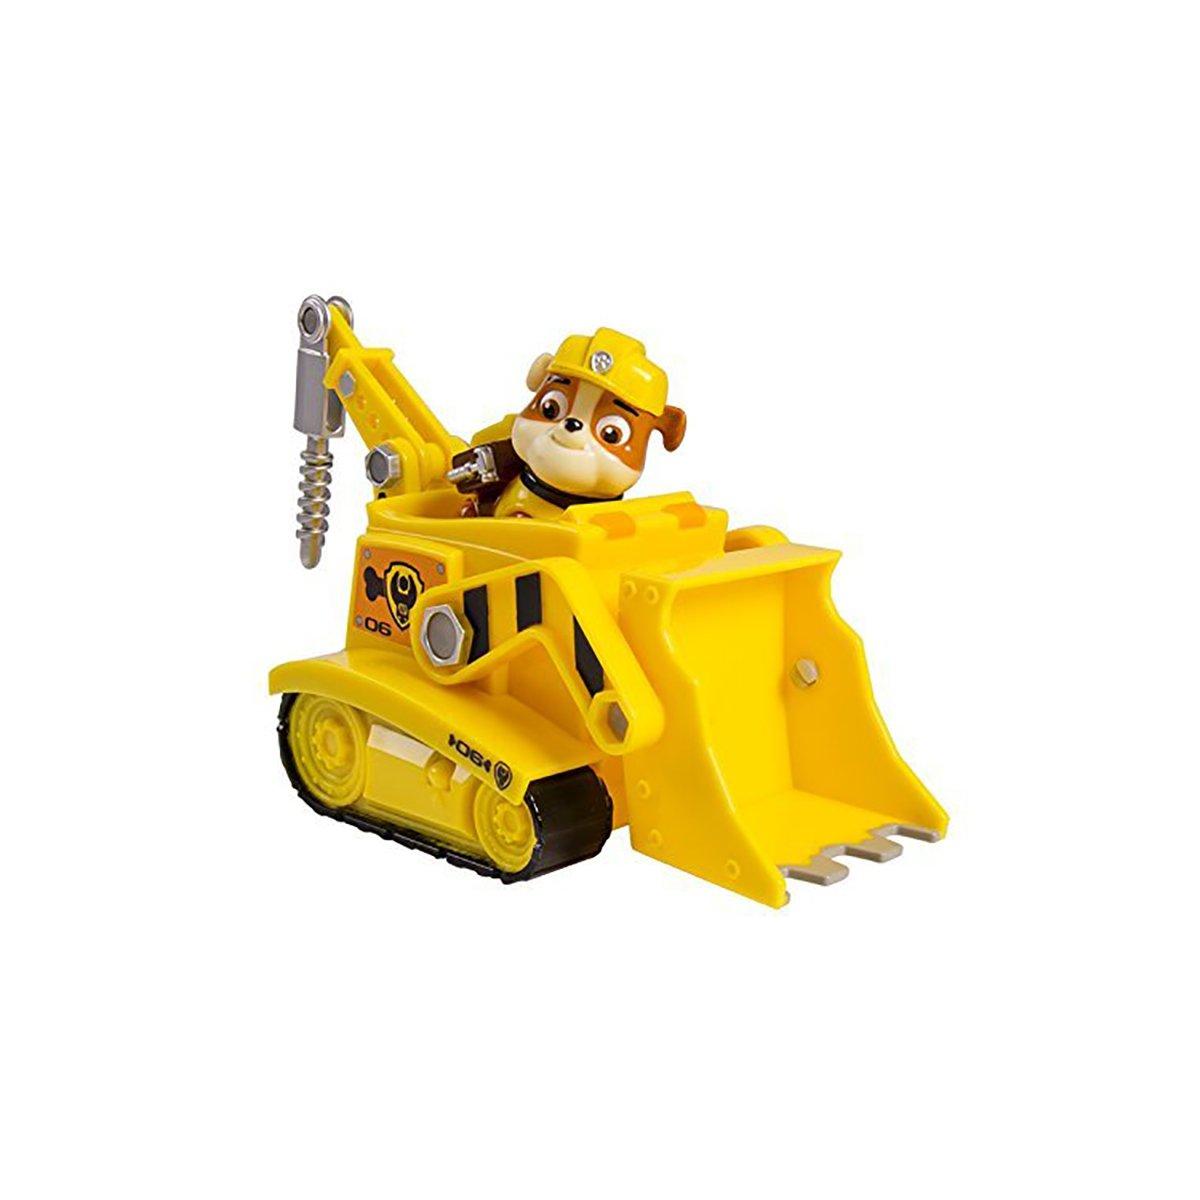 figurina paw patrol - rubble si buldozerul